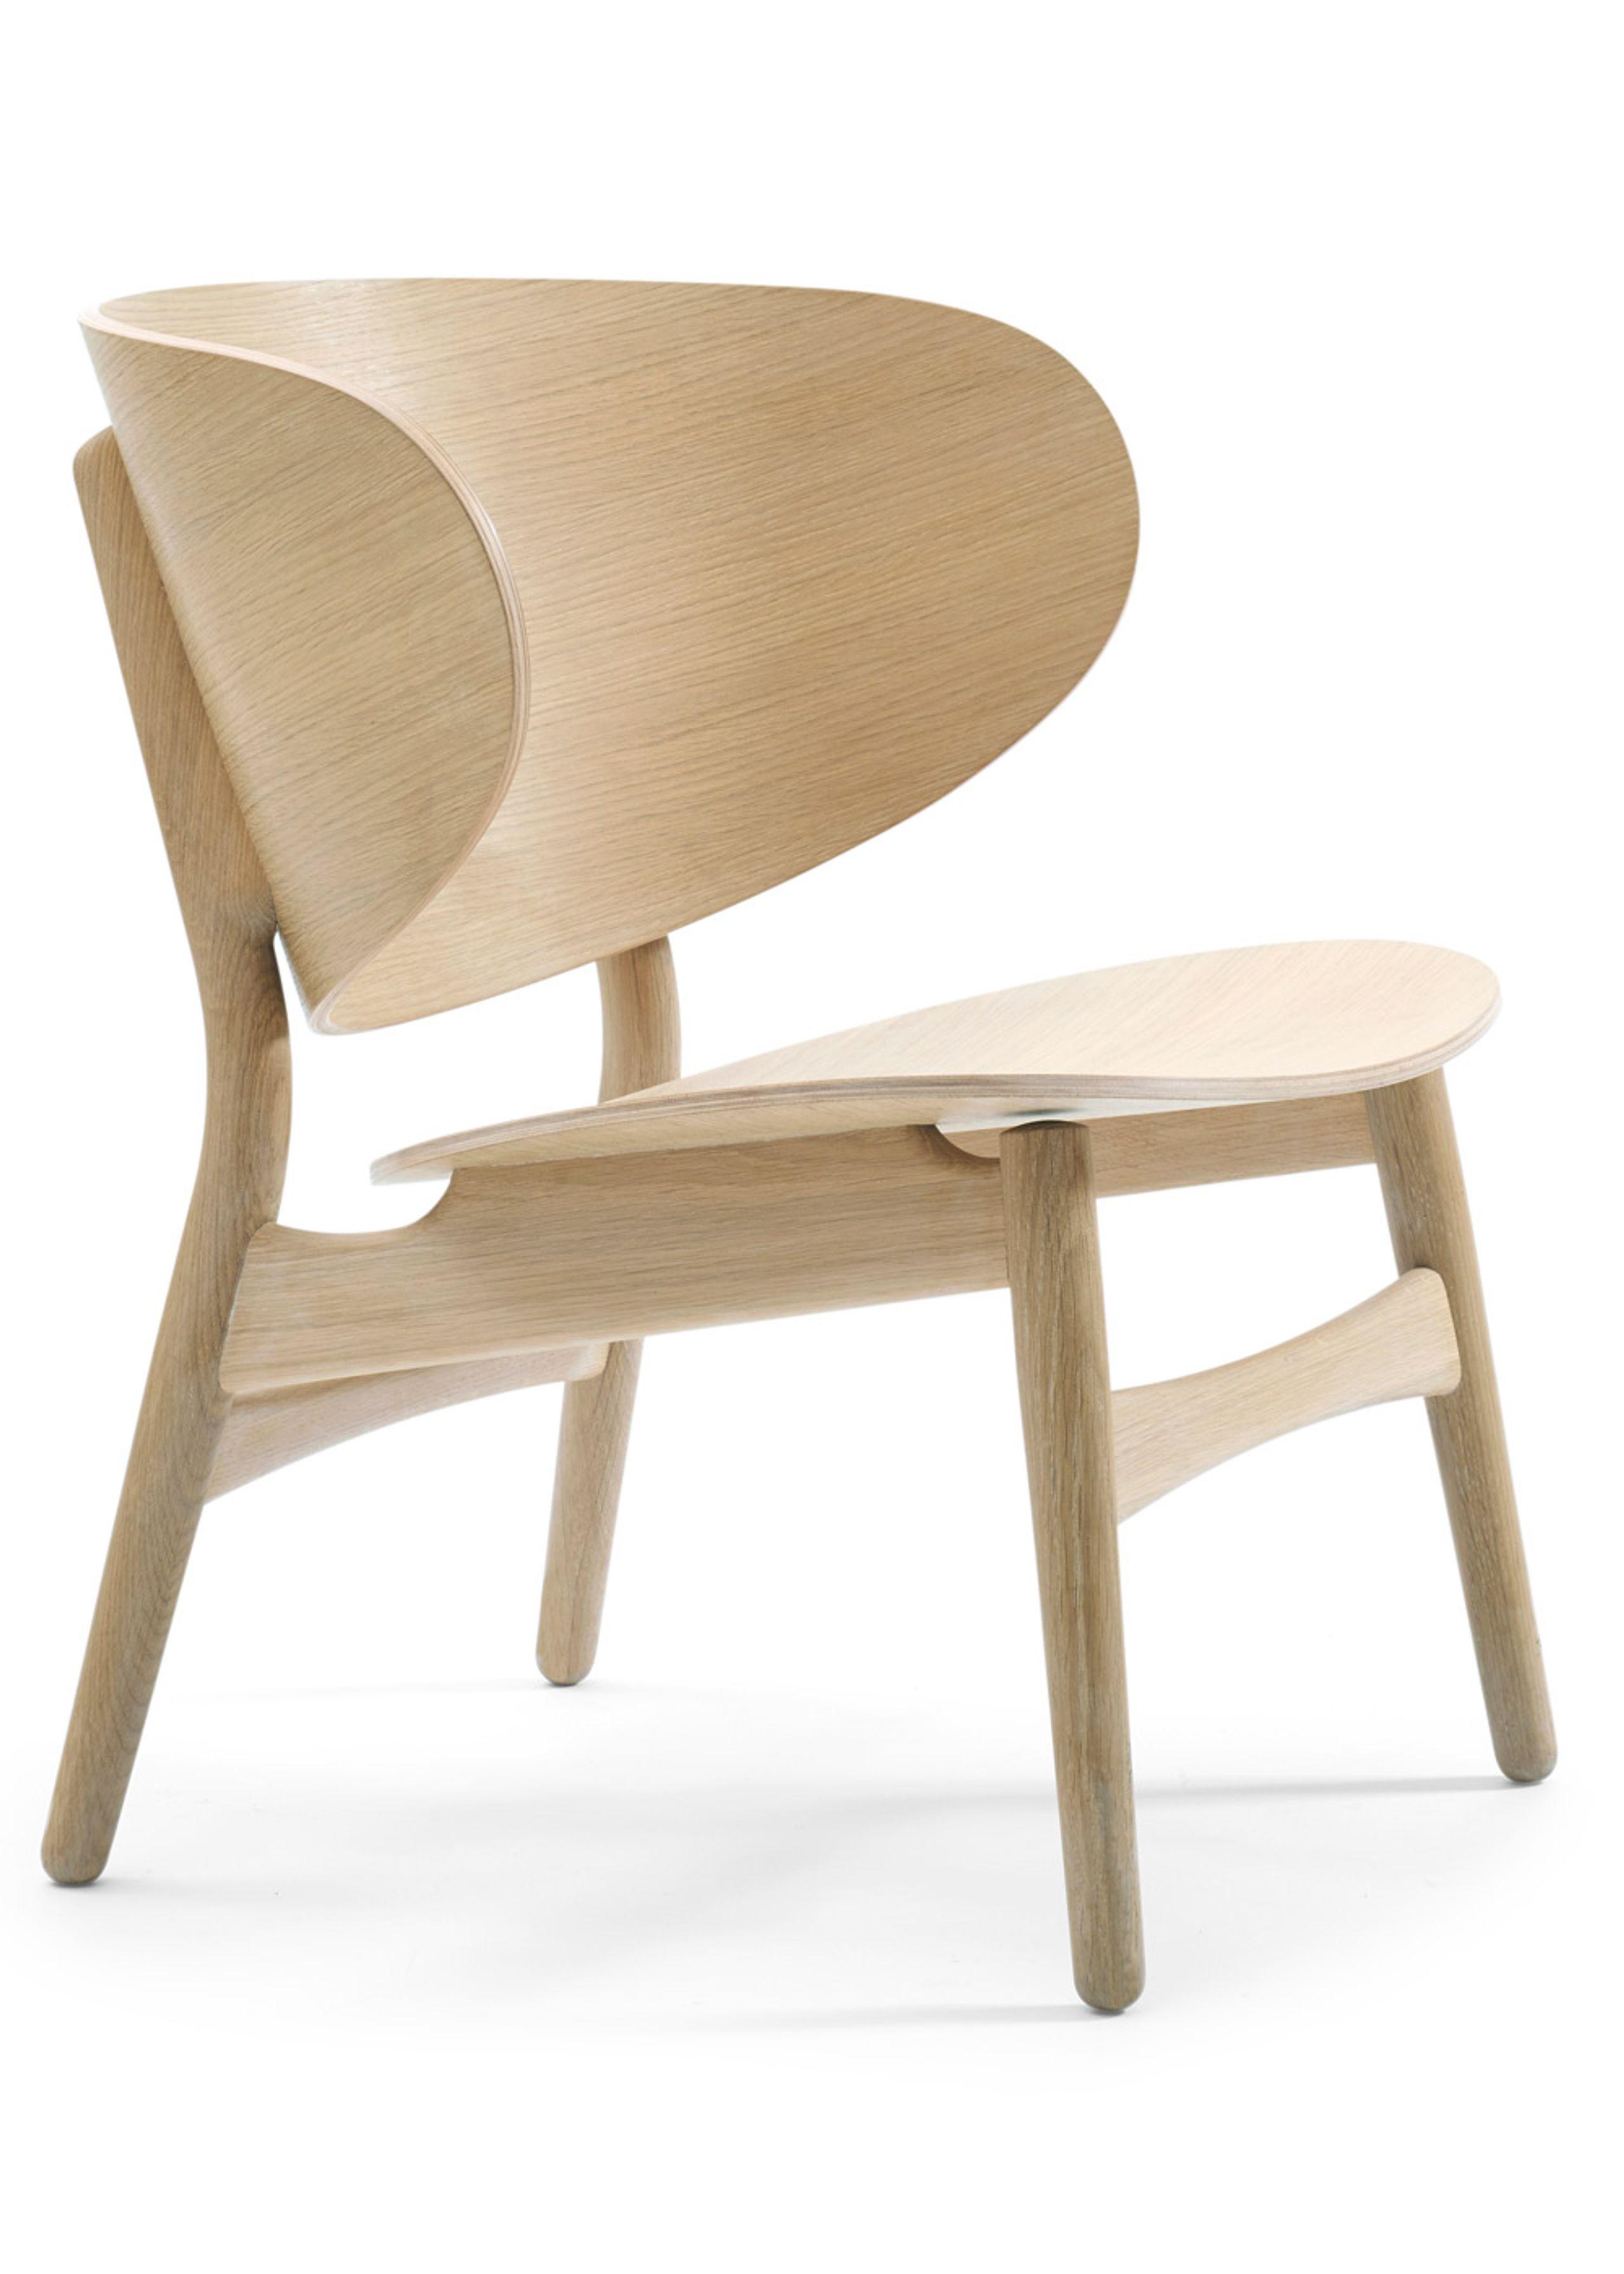 hans j wegner furniture. Getama - Fåtölj GE1936 / Venus Chair By Hans J. Wegner Walnut J Furniture